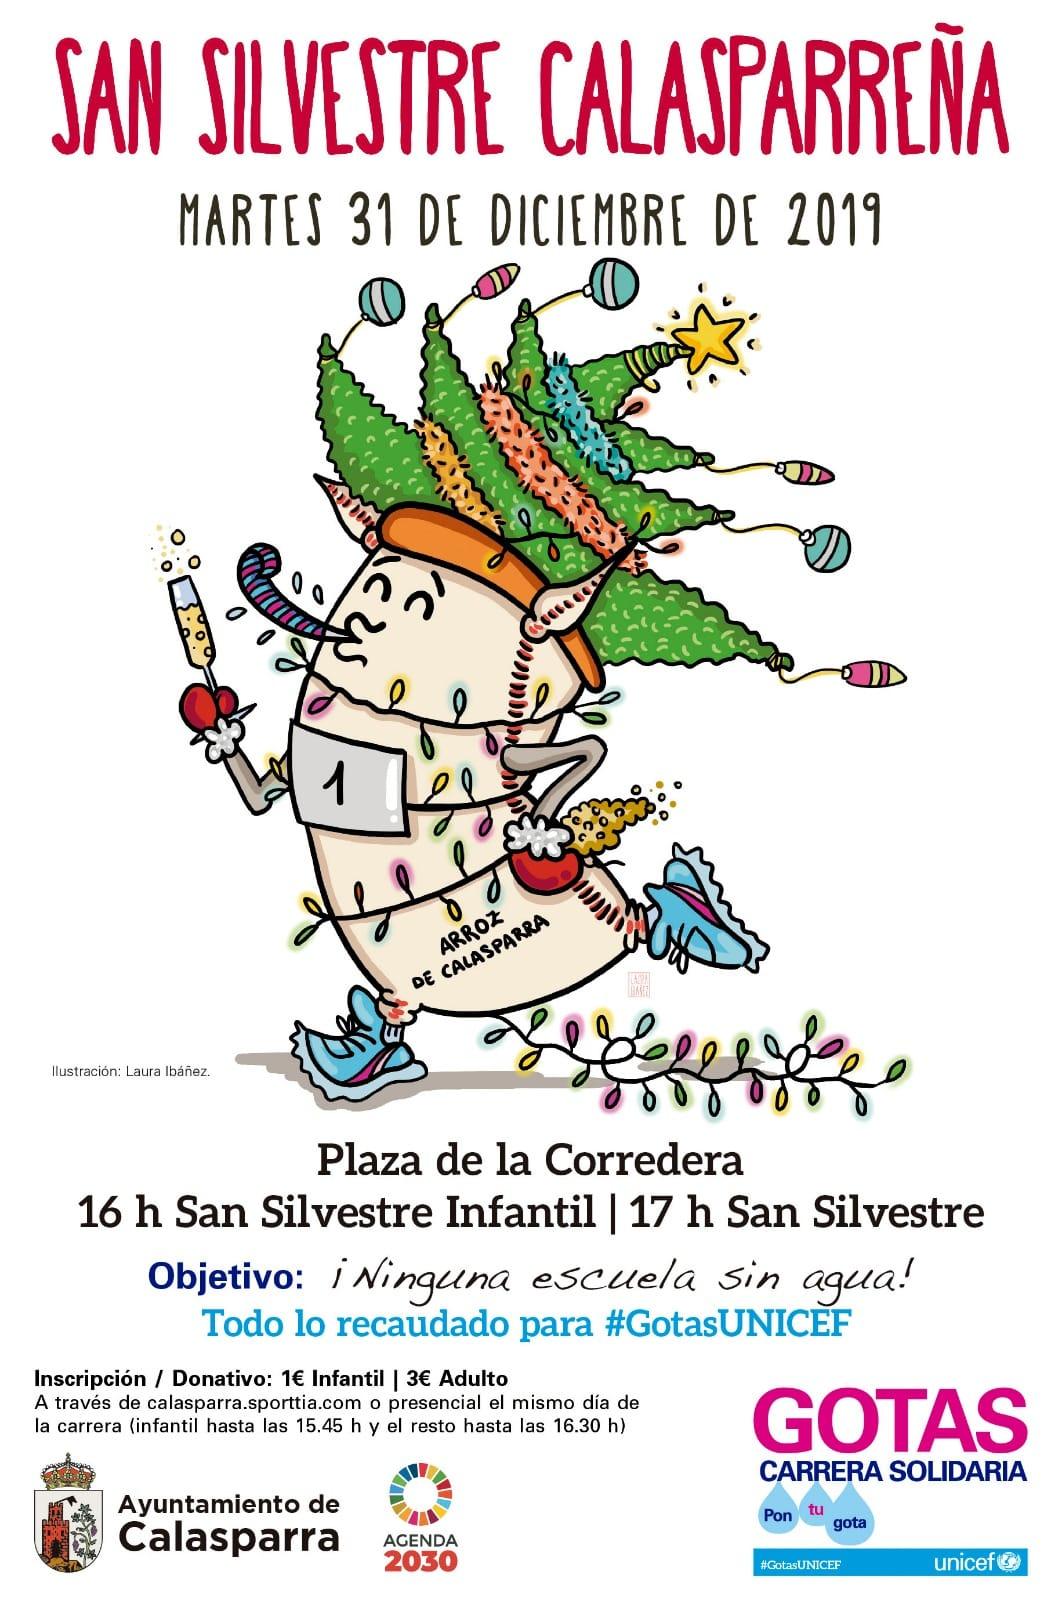 San Silvestre Calasparreña 2019